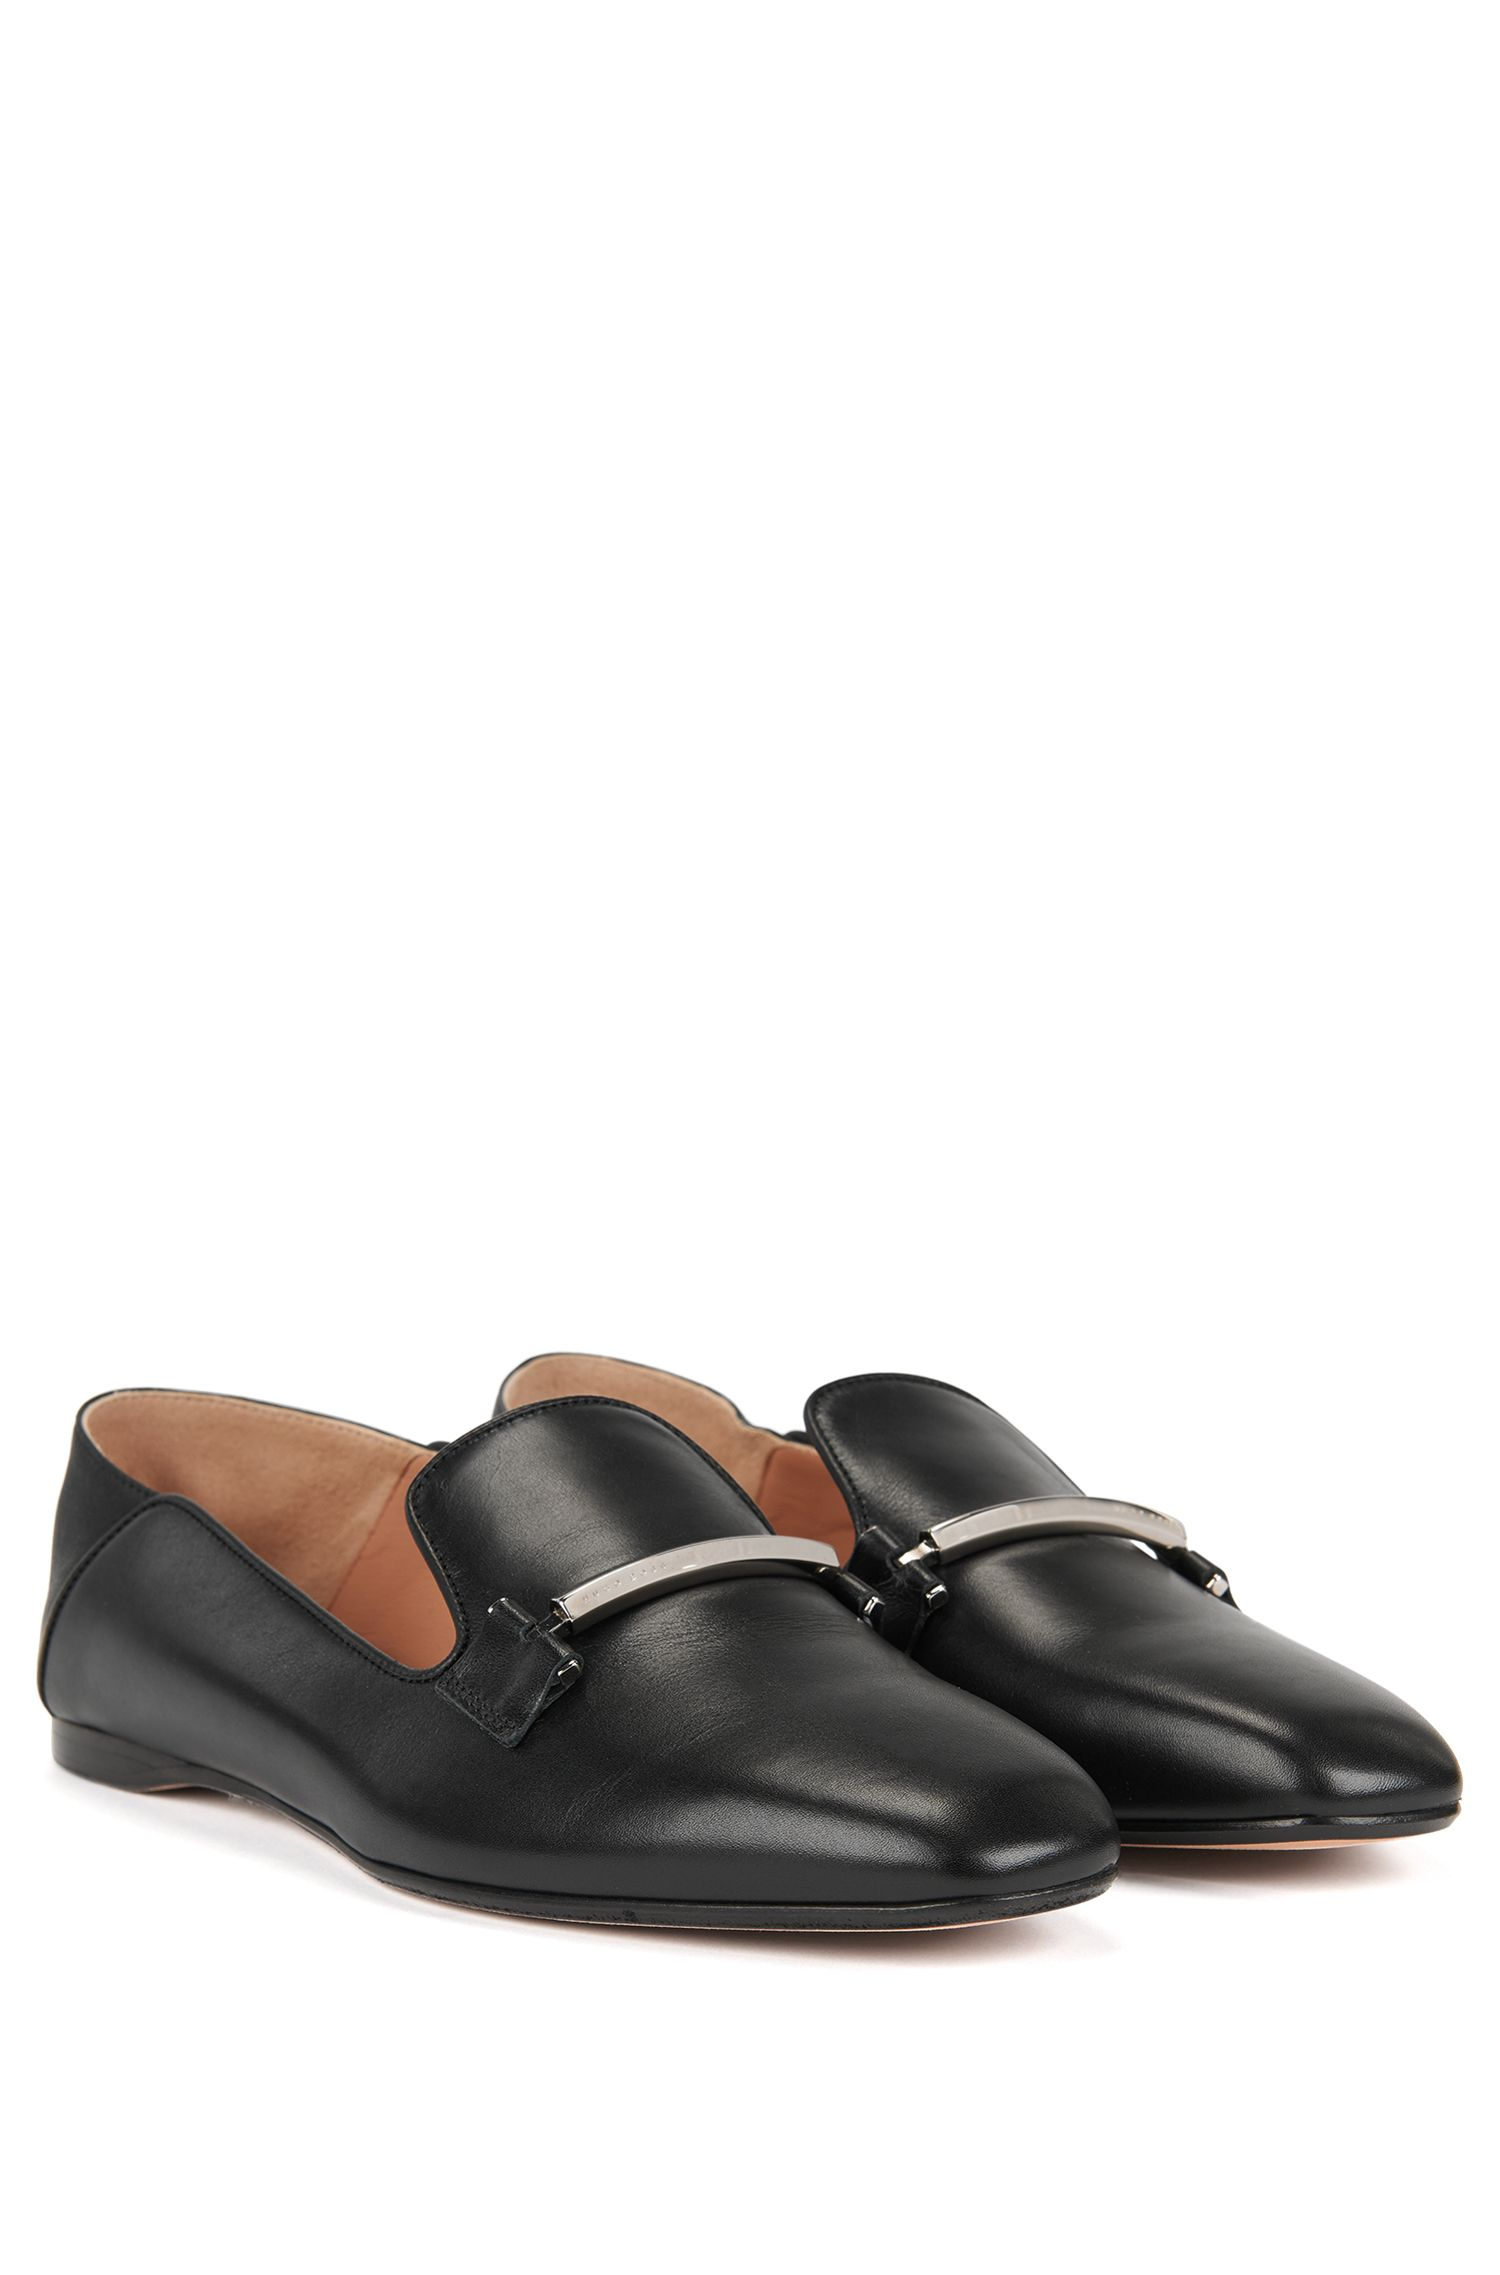 Loafer aus Leder mit umklappbarer Ferse, Schwarz